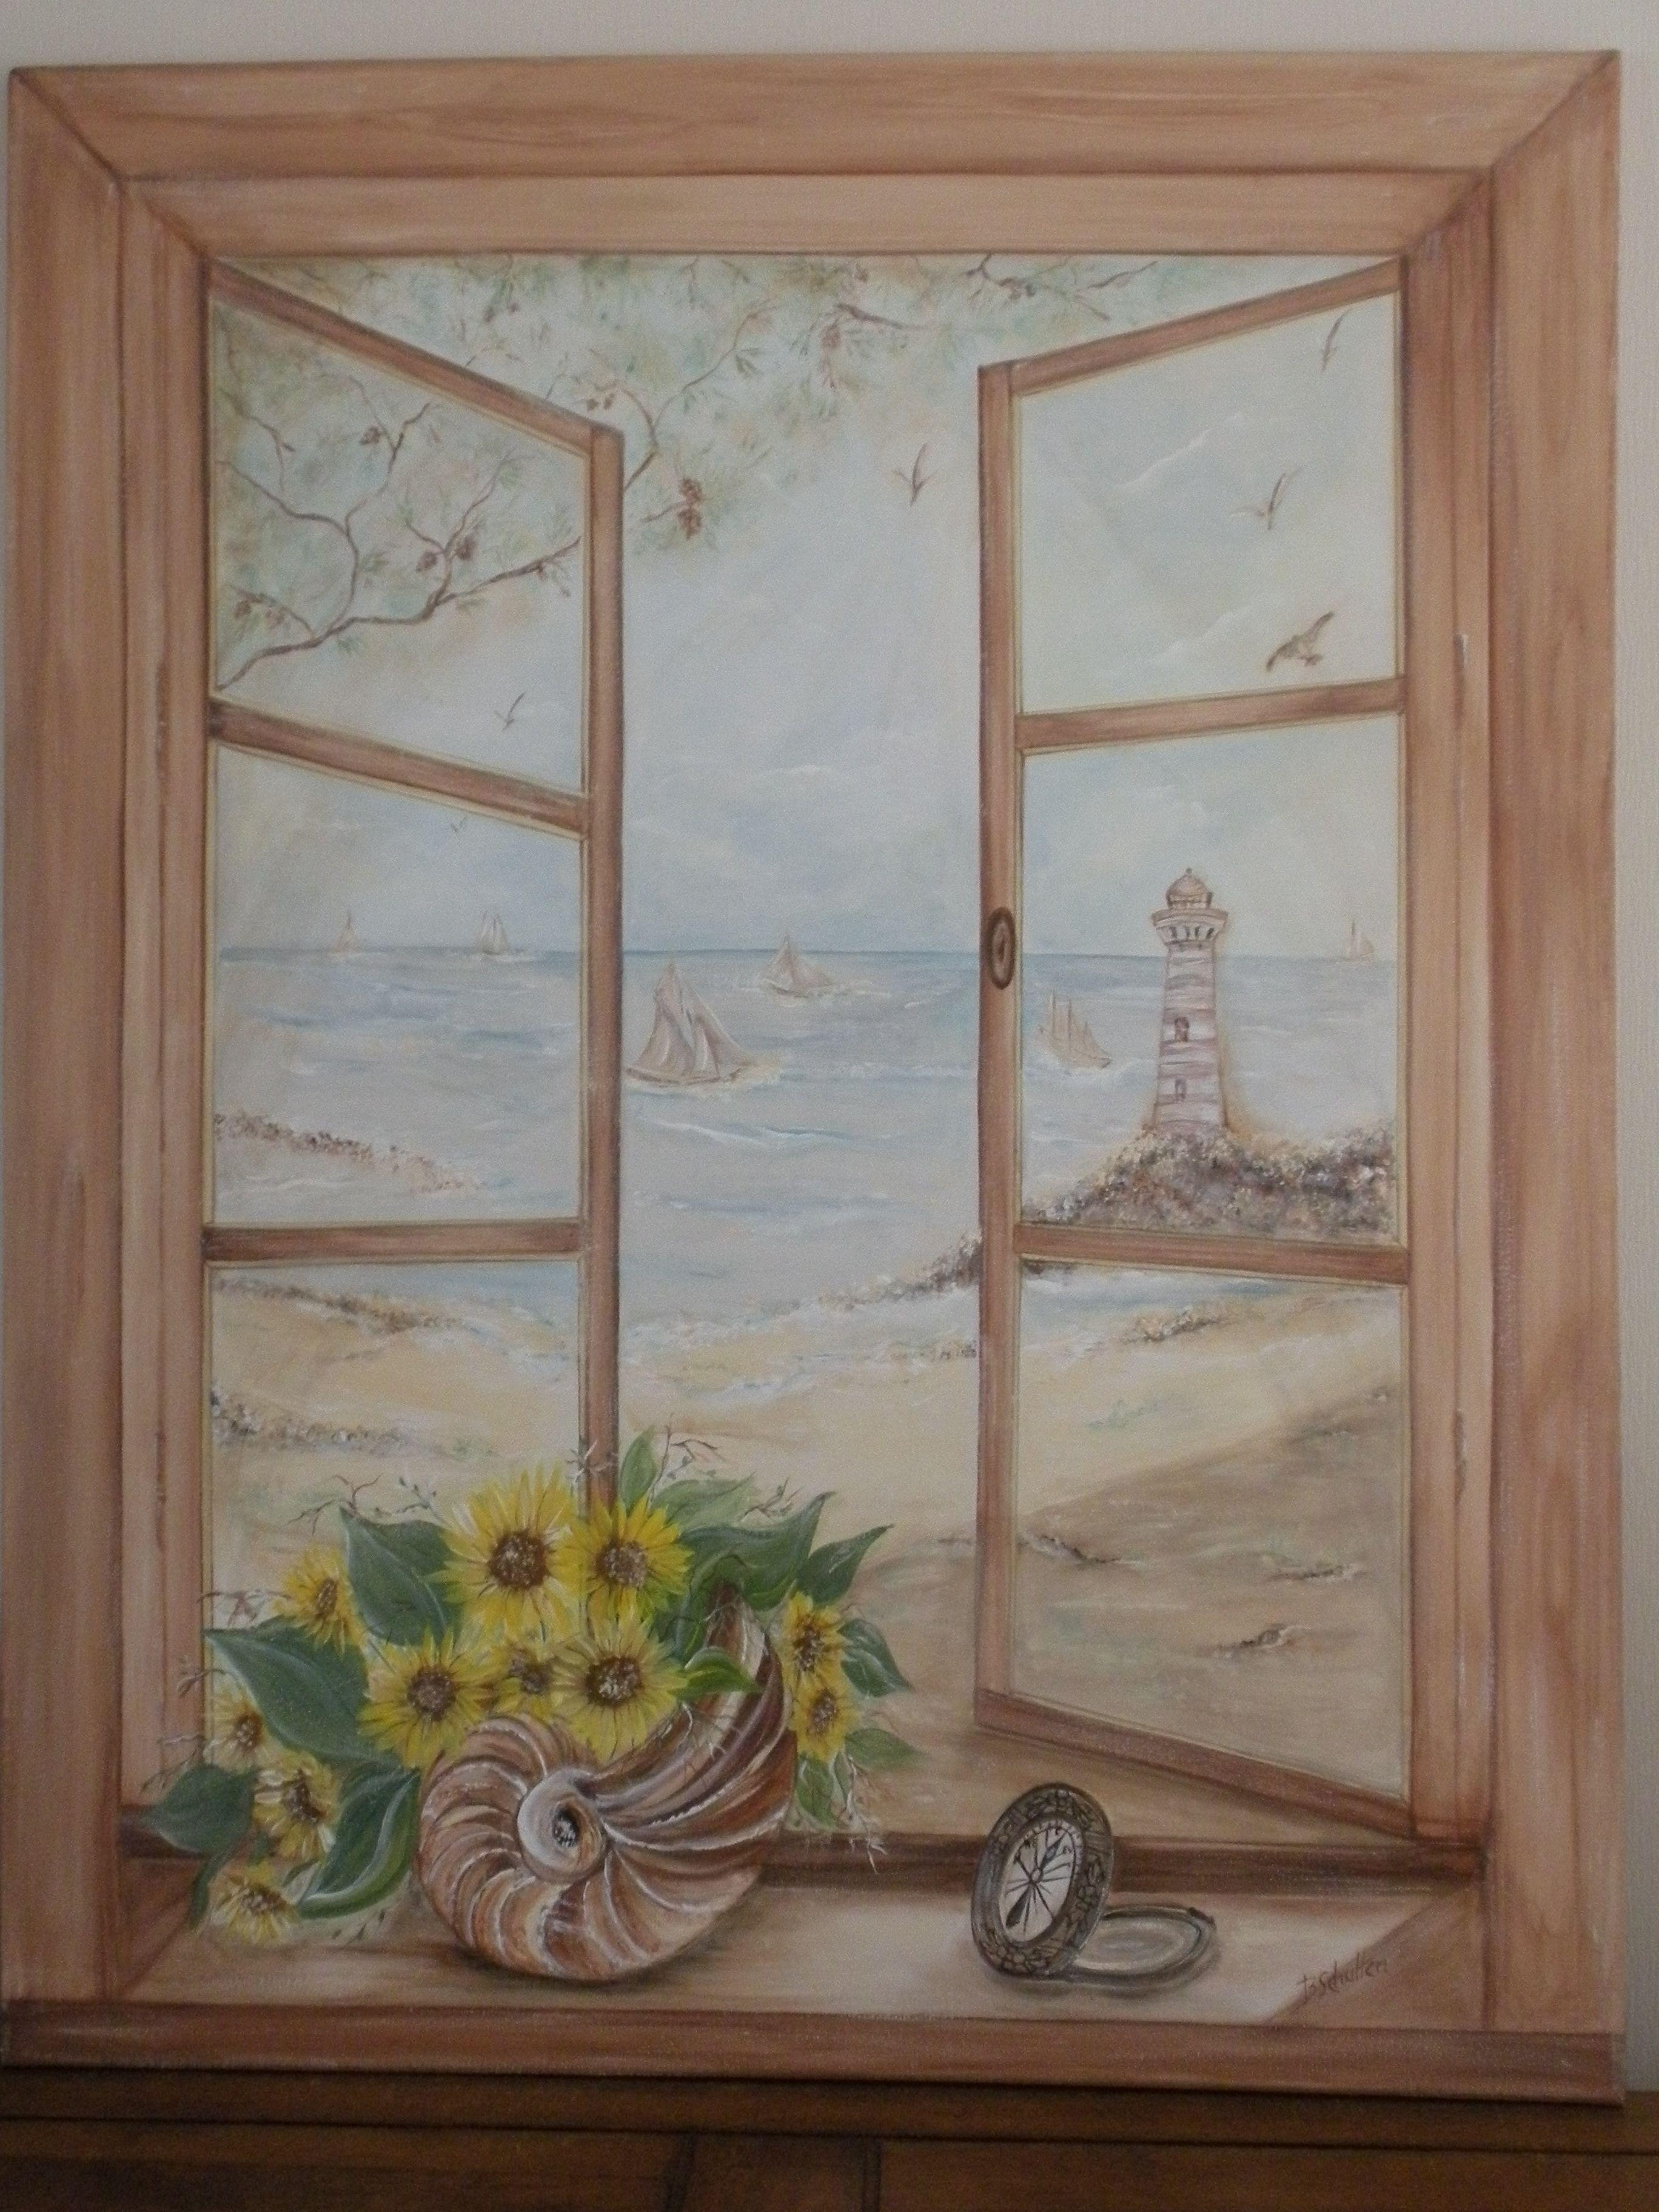 B schutten artiste peintre page 9 for Fenetre 60x80